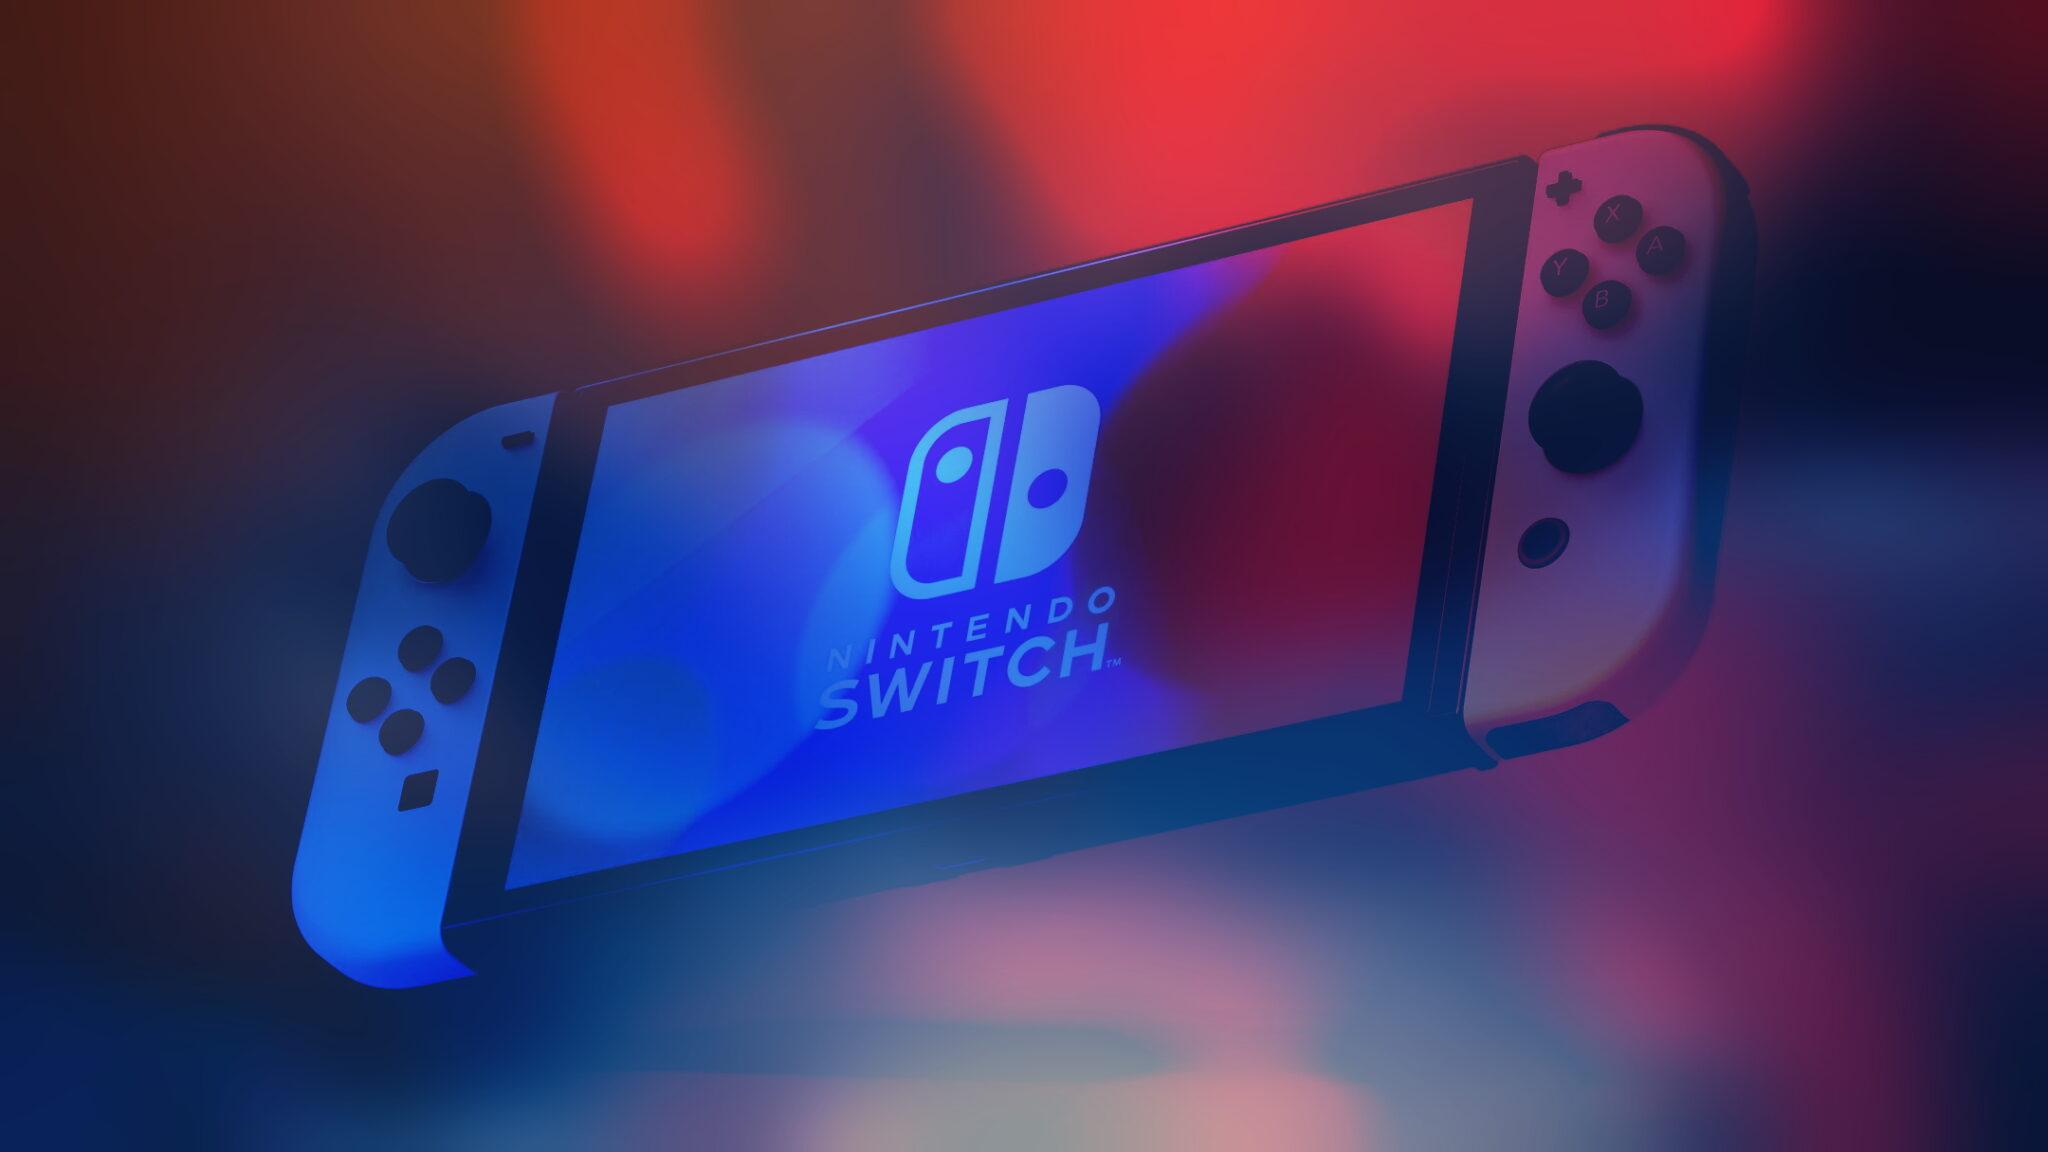 Nintendo Switch - Console